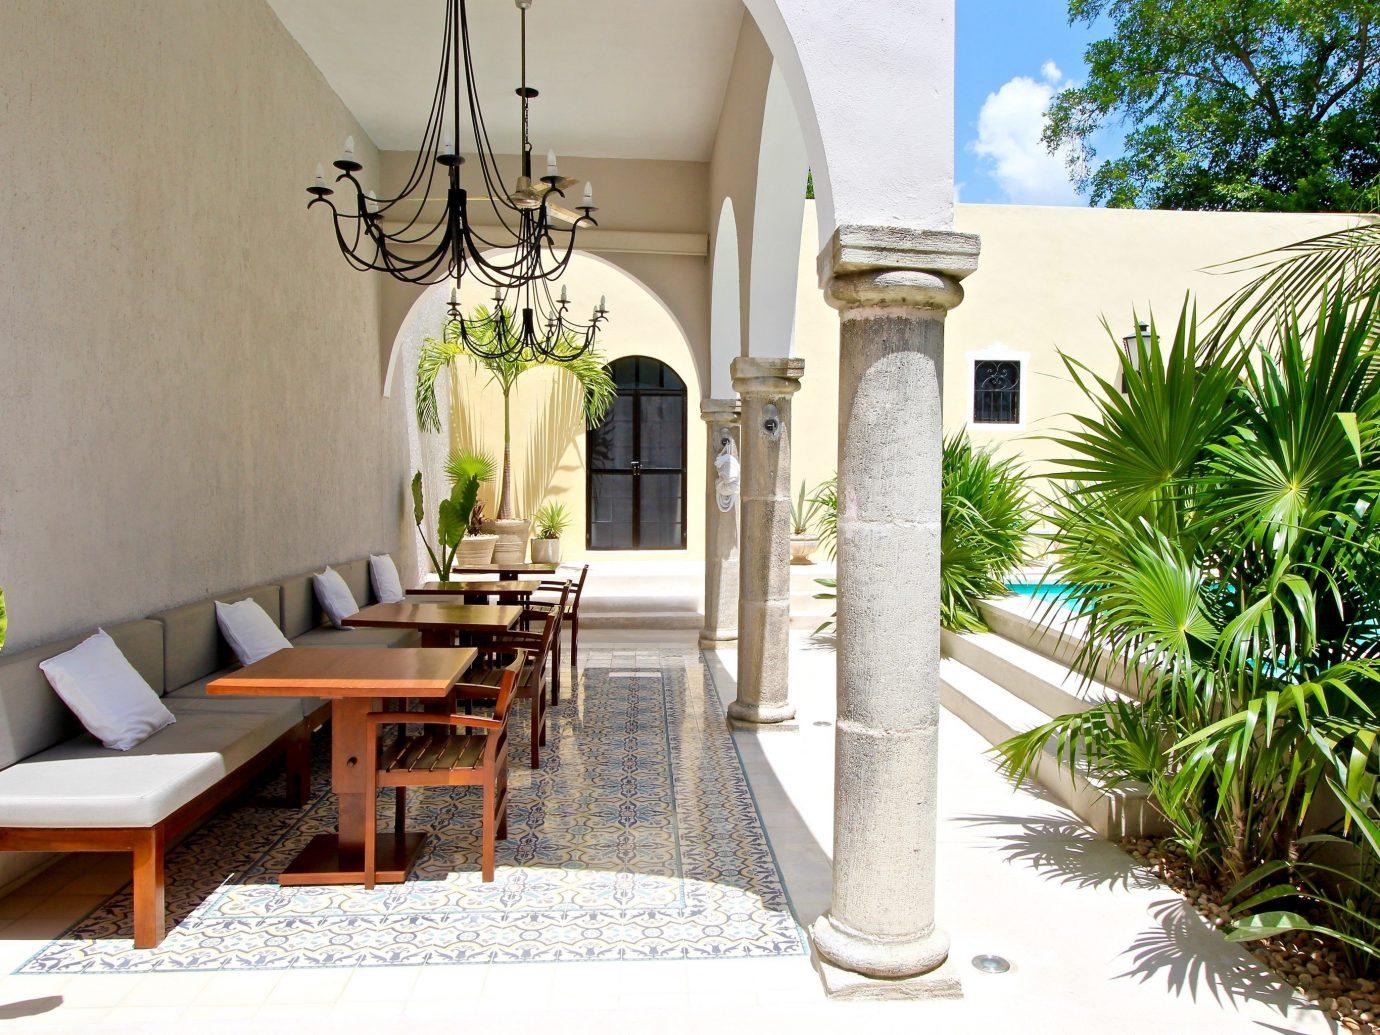 Trip Ideas plant property room estate home Villa condominium furniture Dining interior design real estate cottage mansion Resort apartment area dining table